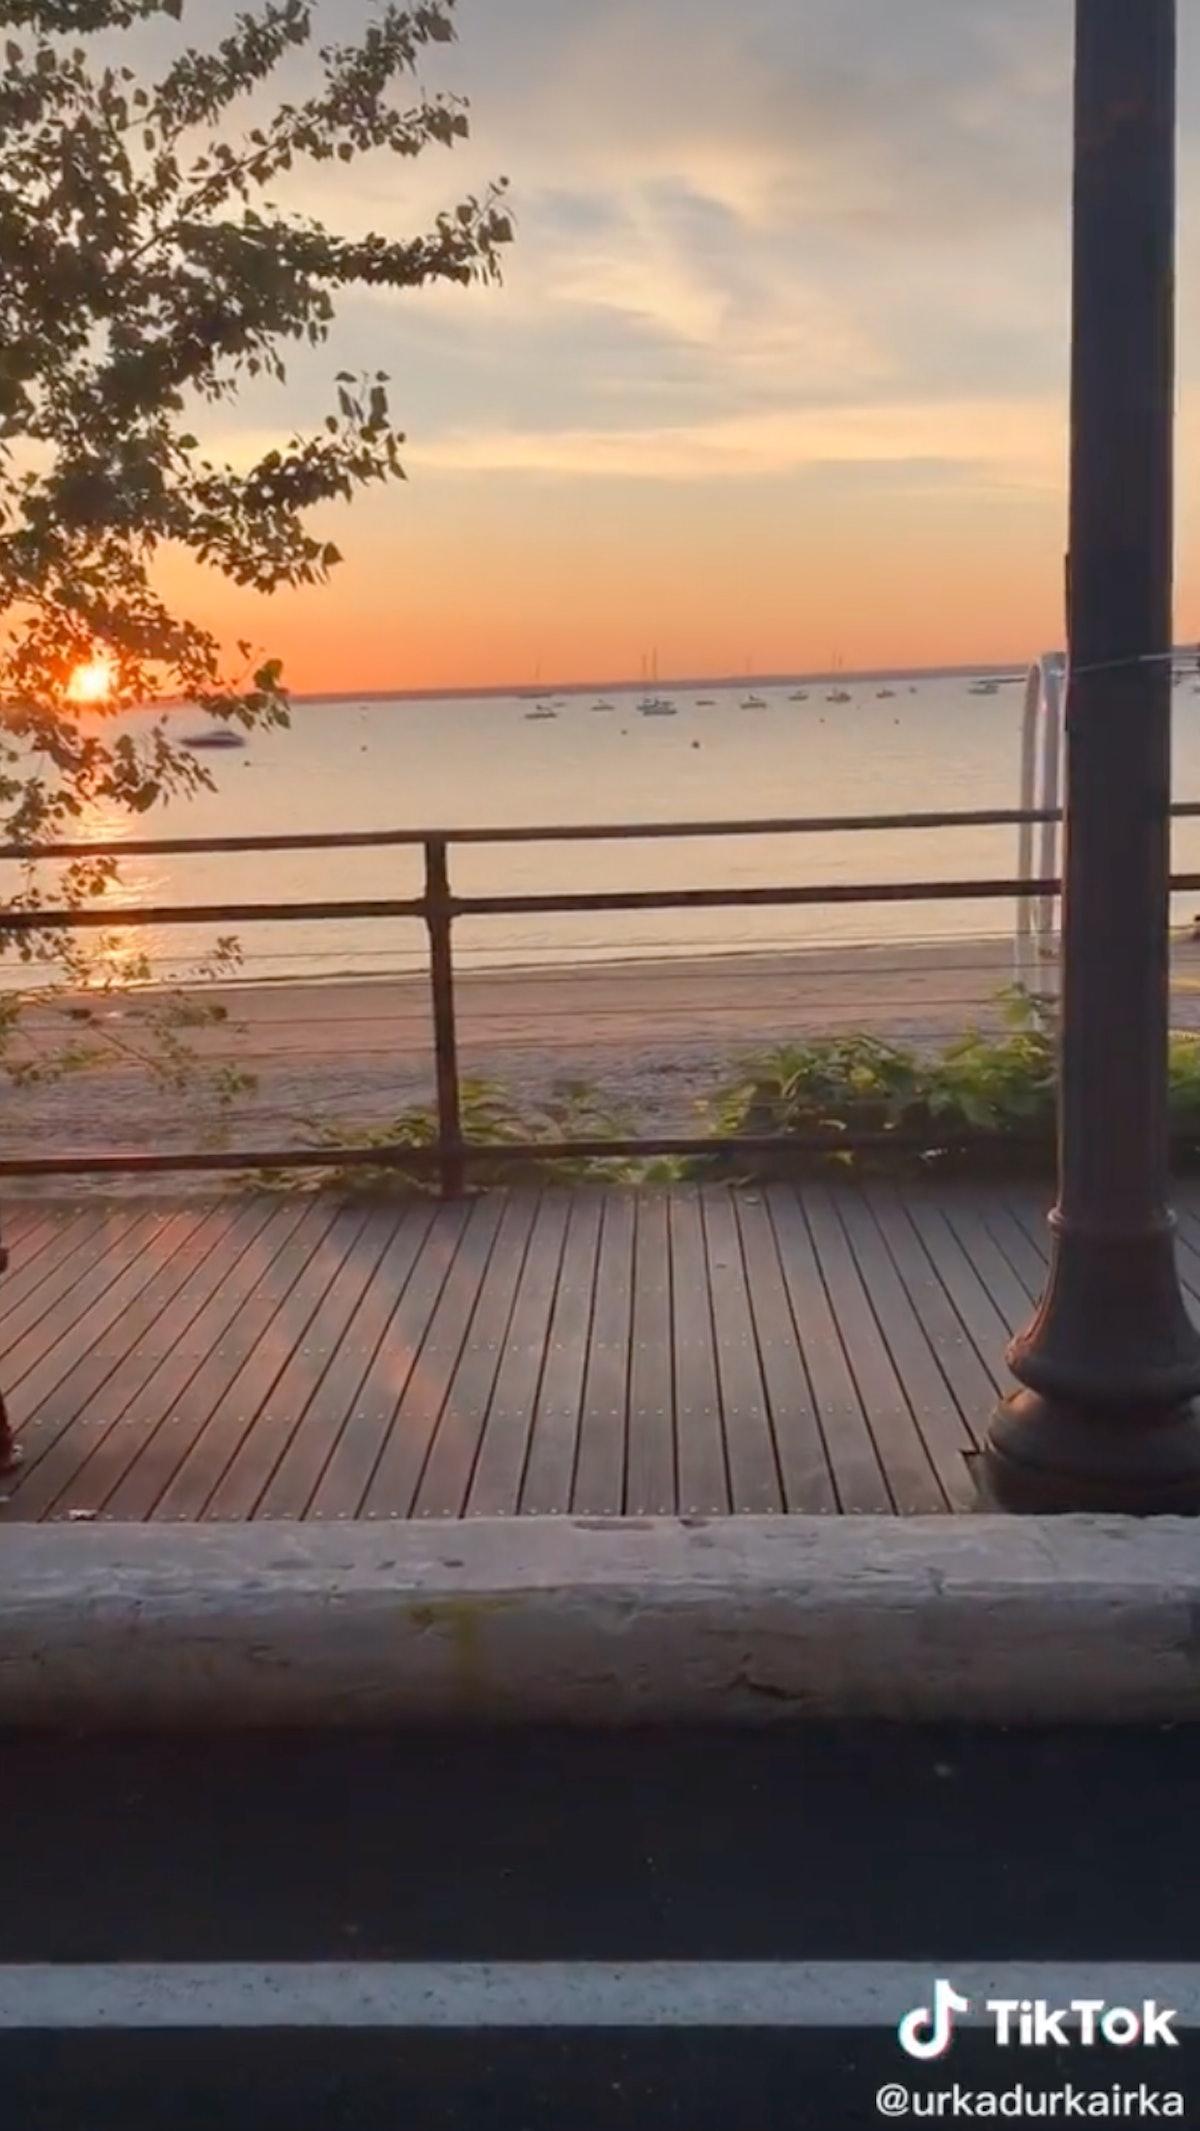 These 14 best viral hidden gem TikTok videos include so many great recs.